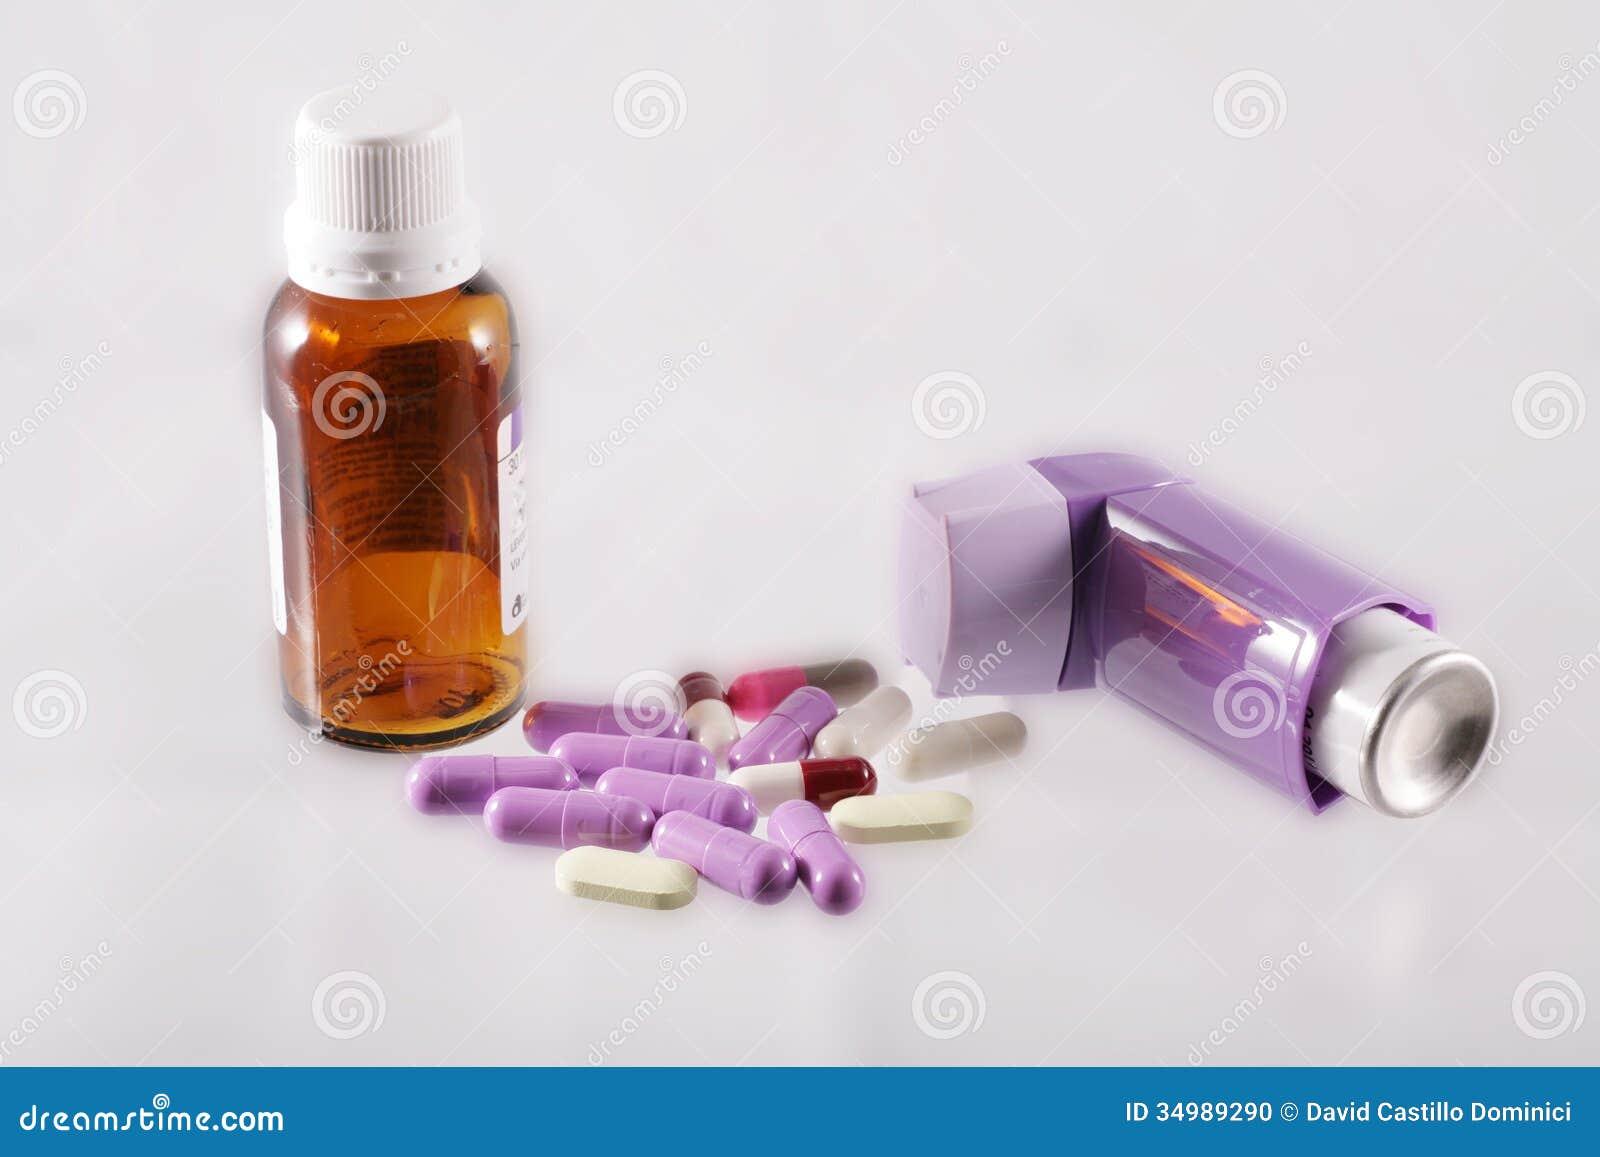 Proventil hfa inhalation : uses, side effects